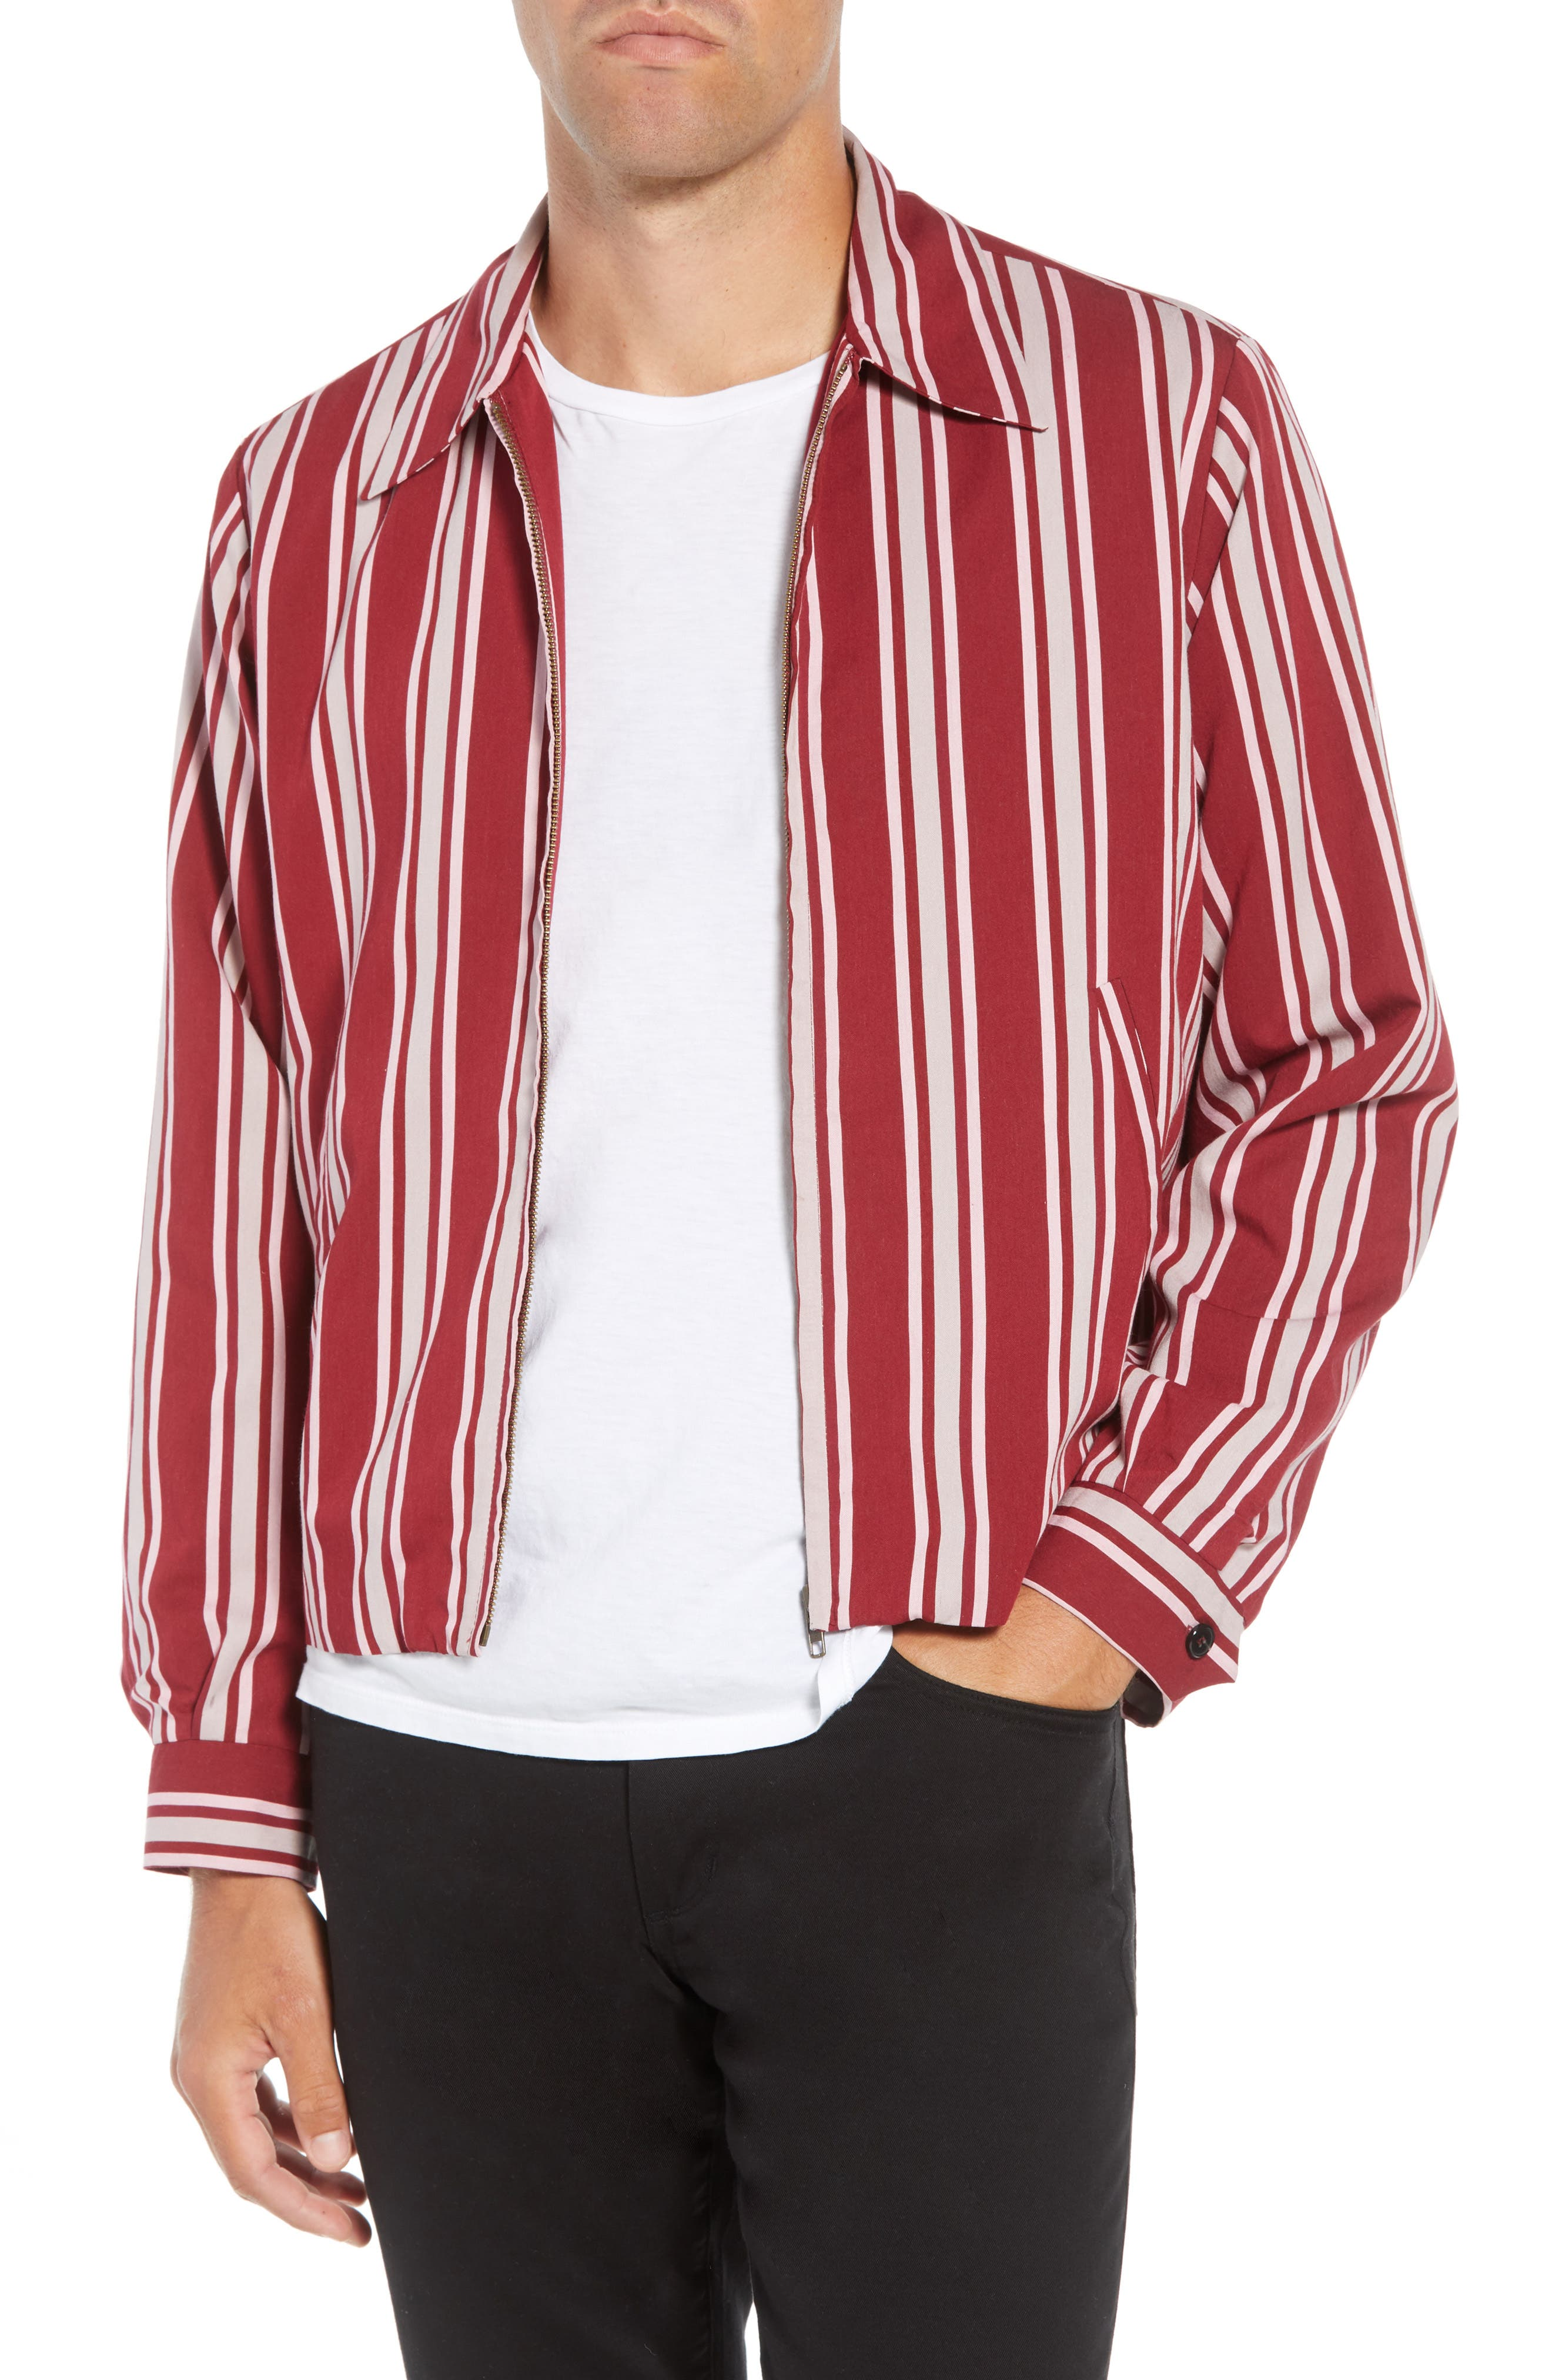 Fifty Regular Fit Shirt Jacket,                         Main,                         color, RED STRIPE